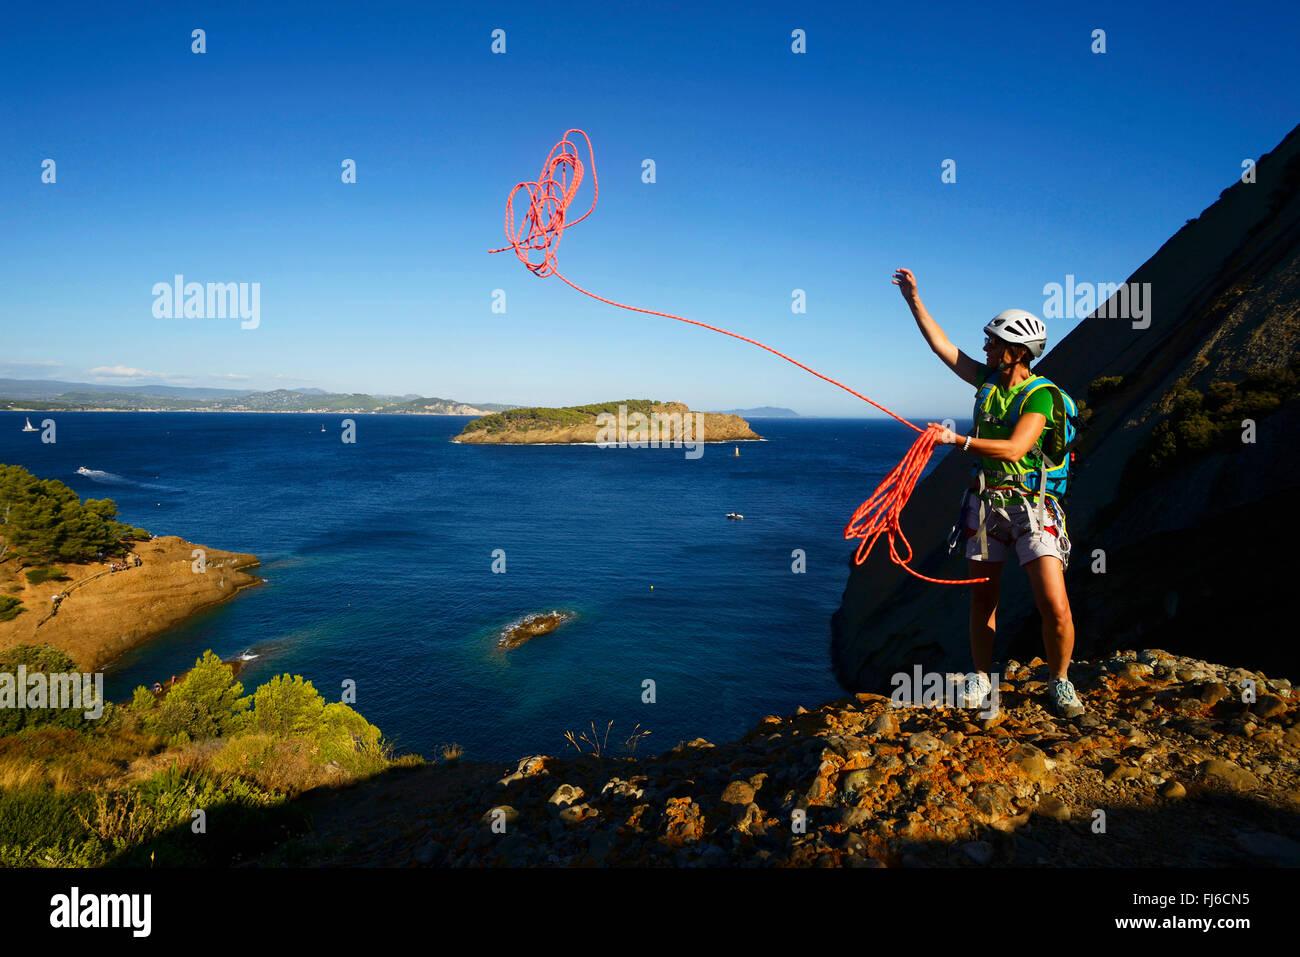 climber throwing a rope at coastal rock Bec de l'Aigle, adventure way, France, Provence, Calanques National - Stock Image